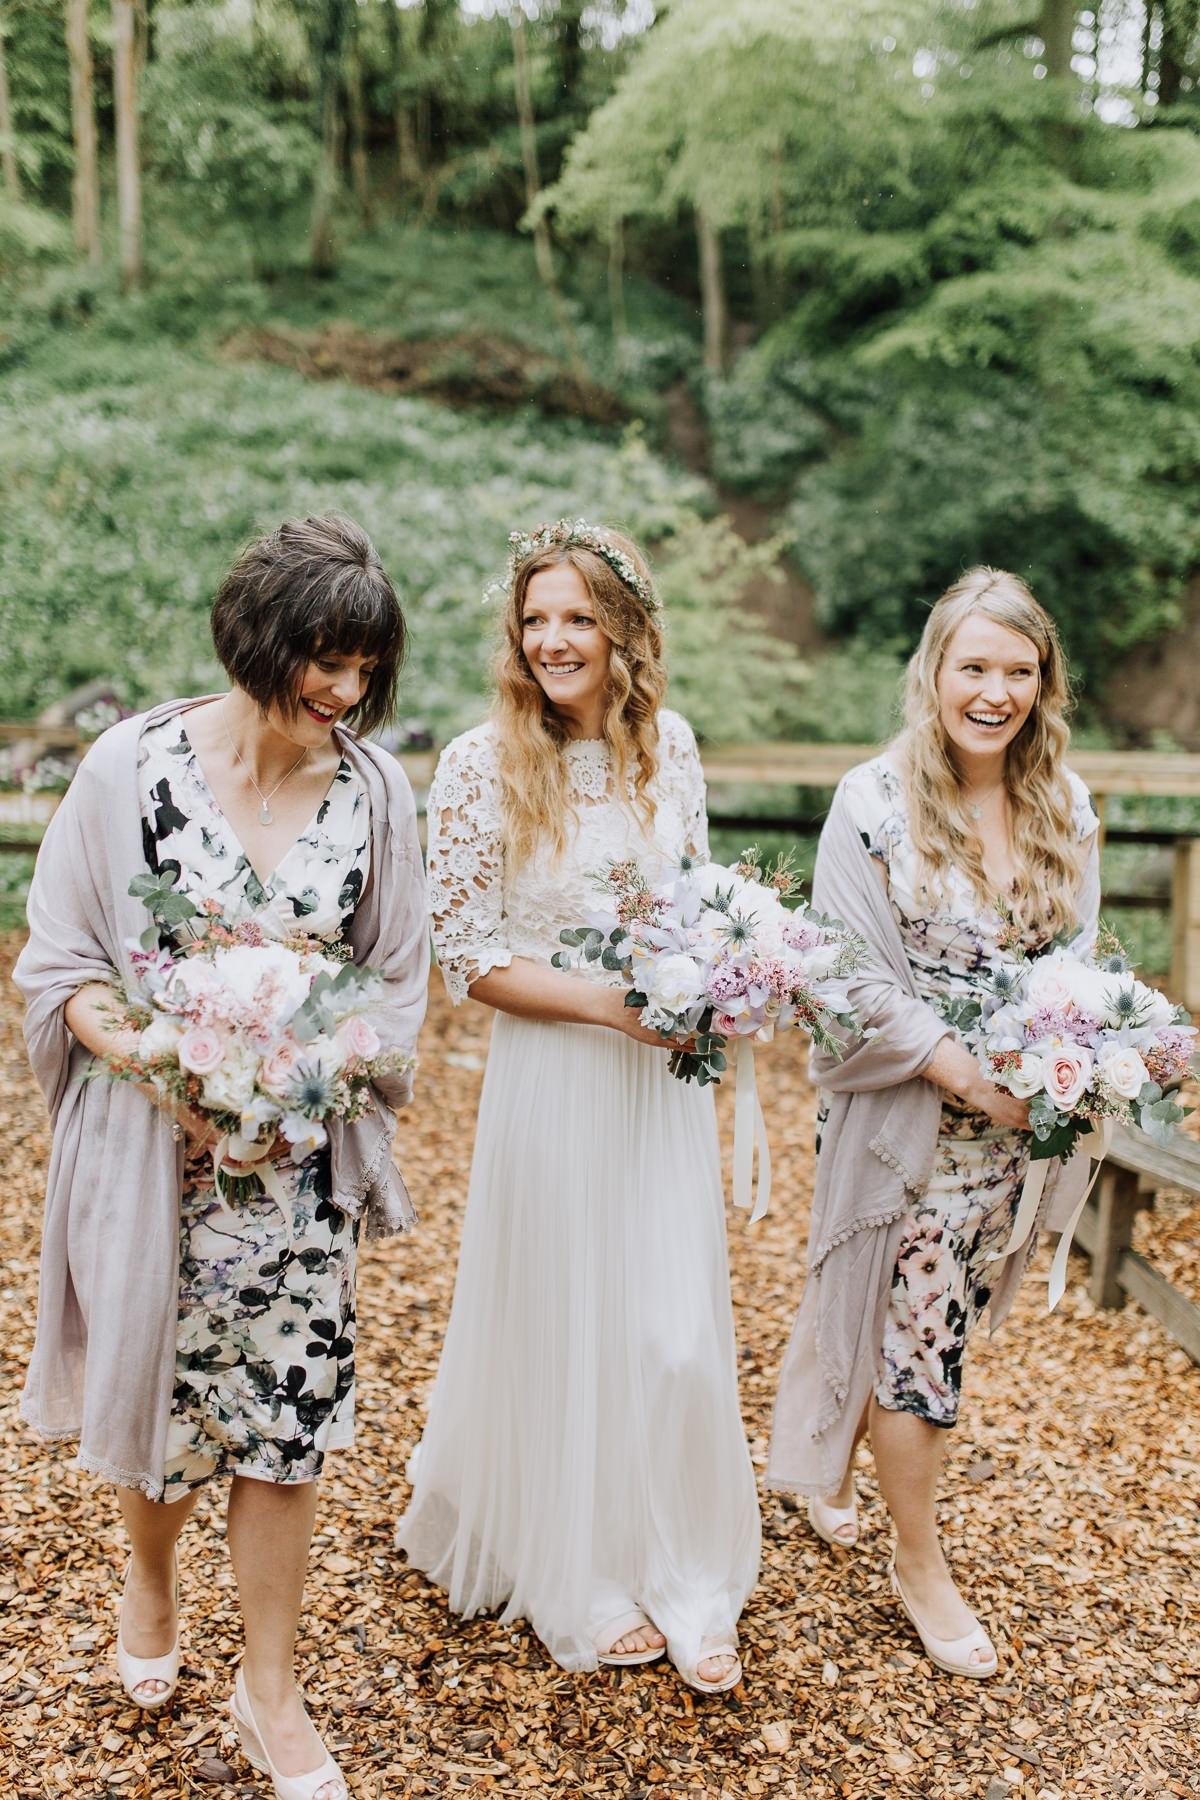 North Yorkshire Wedding Photographer » Natalie Pluck regarding Wedding Hairstyles North Yorkshire